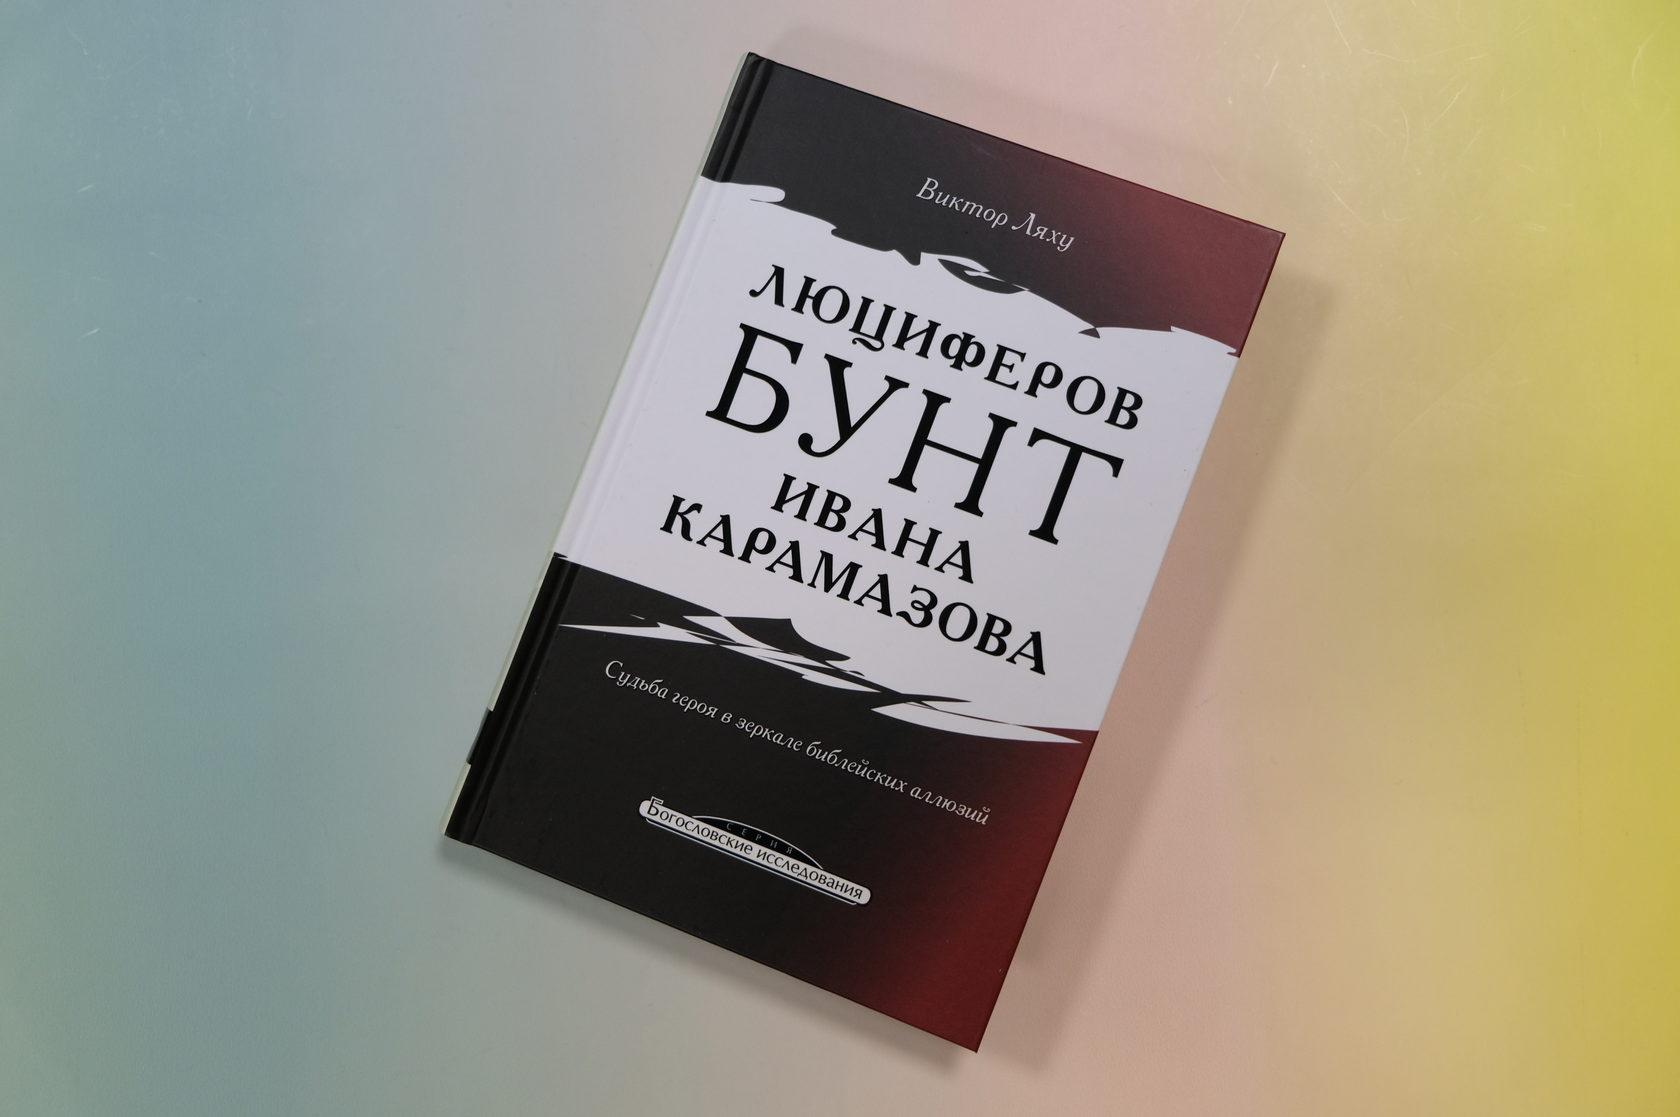 Виктор Ляху «Люциферов бунт Ивана Карамазова. Судьба героя в зеркале библейских аллюзий»